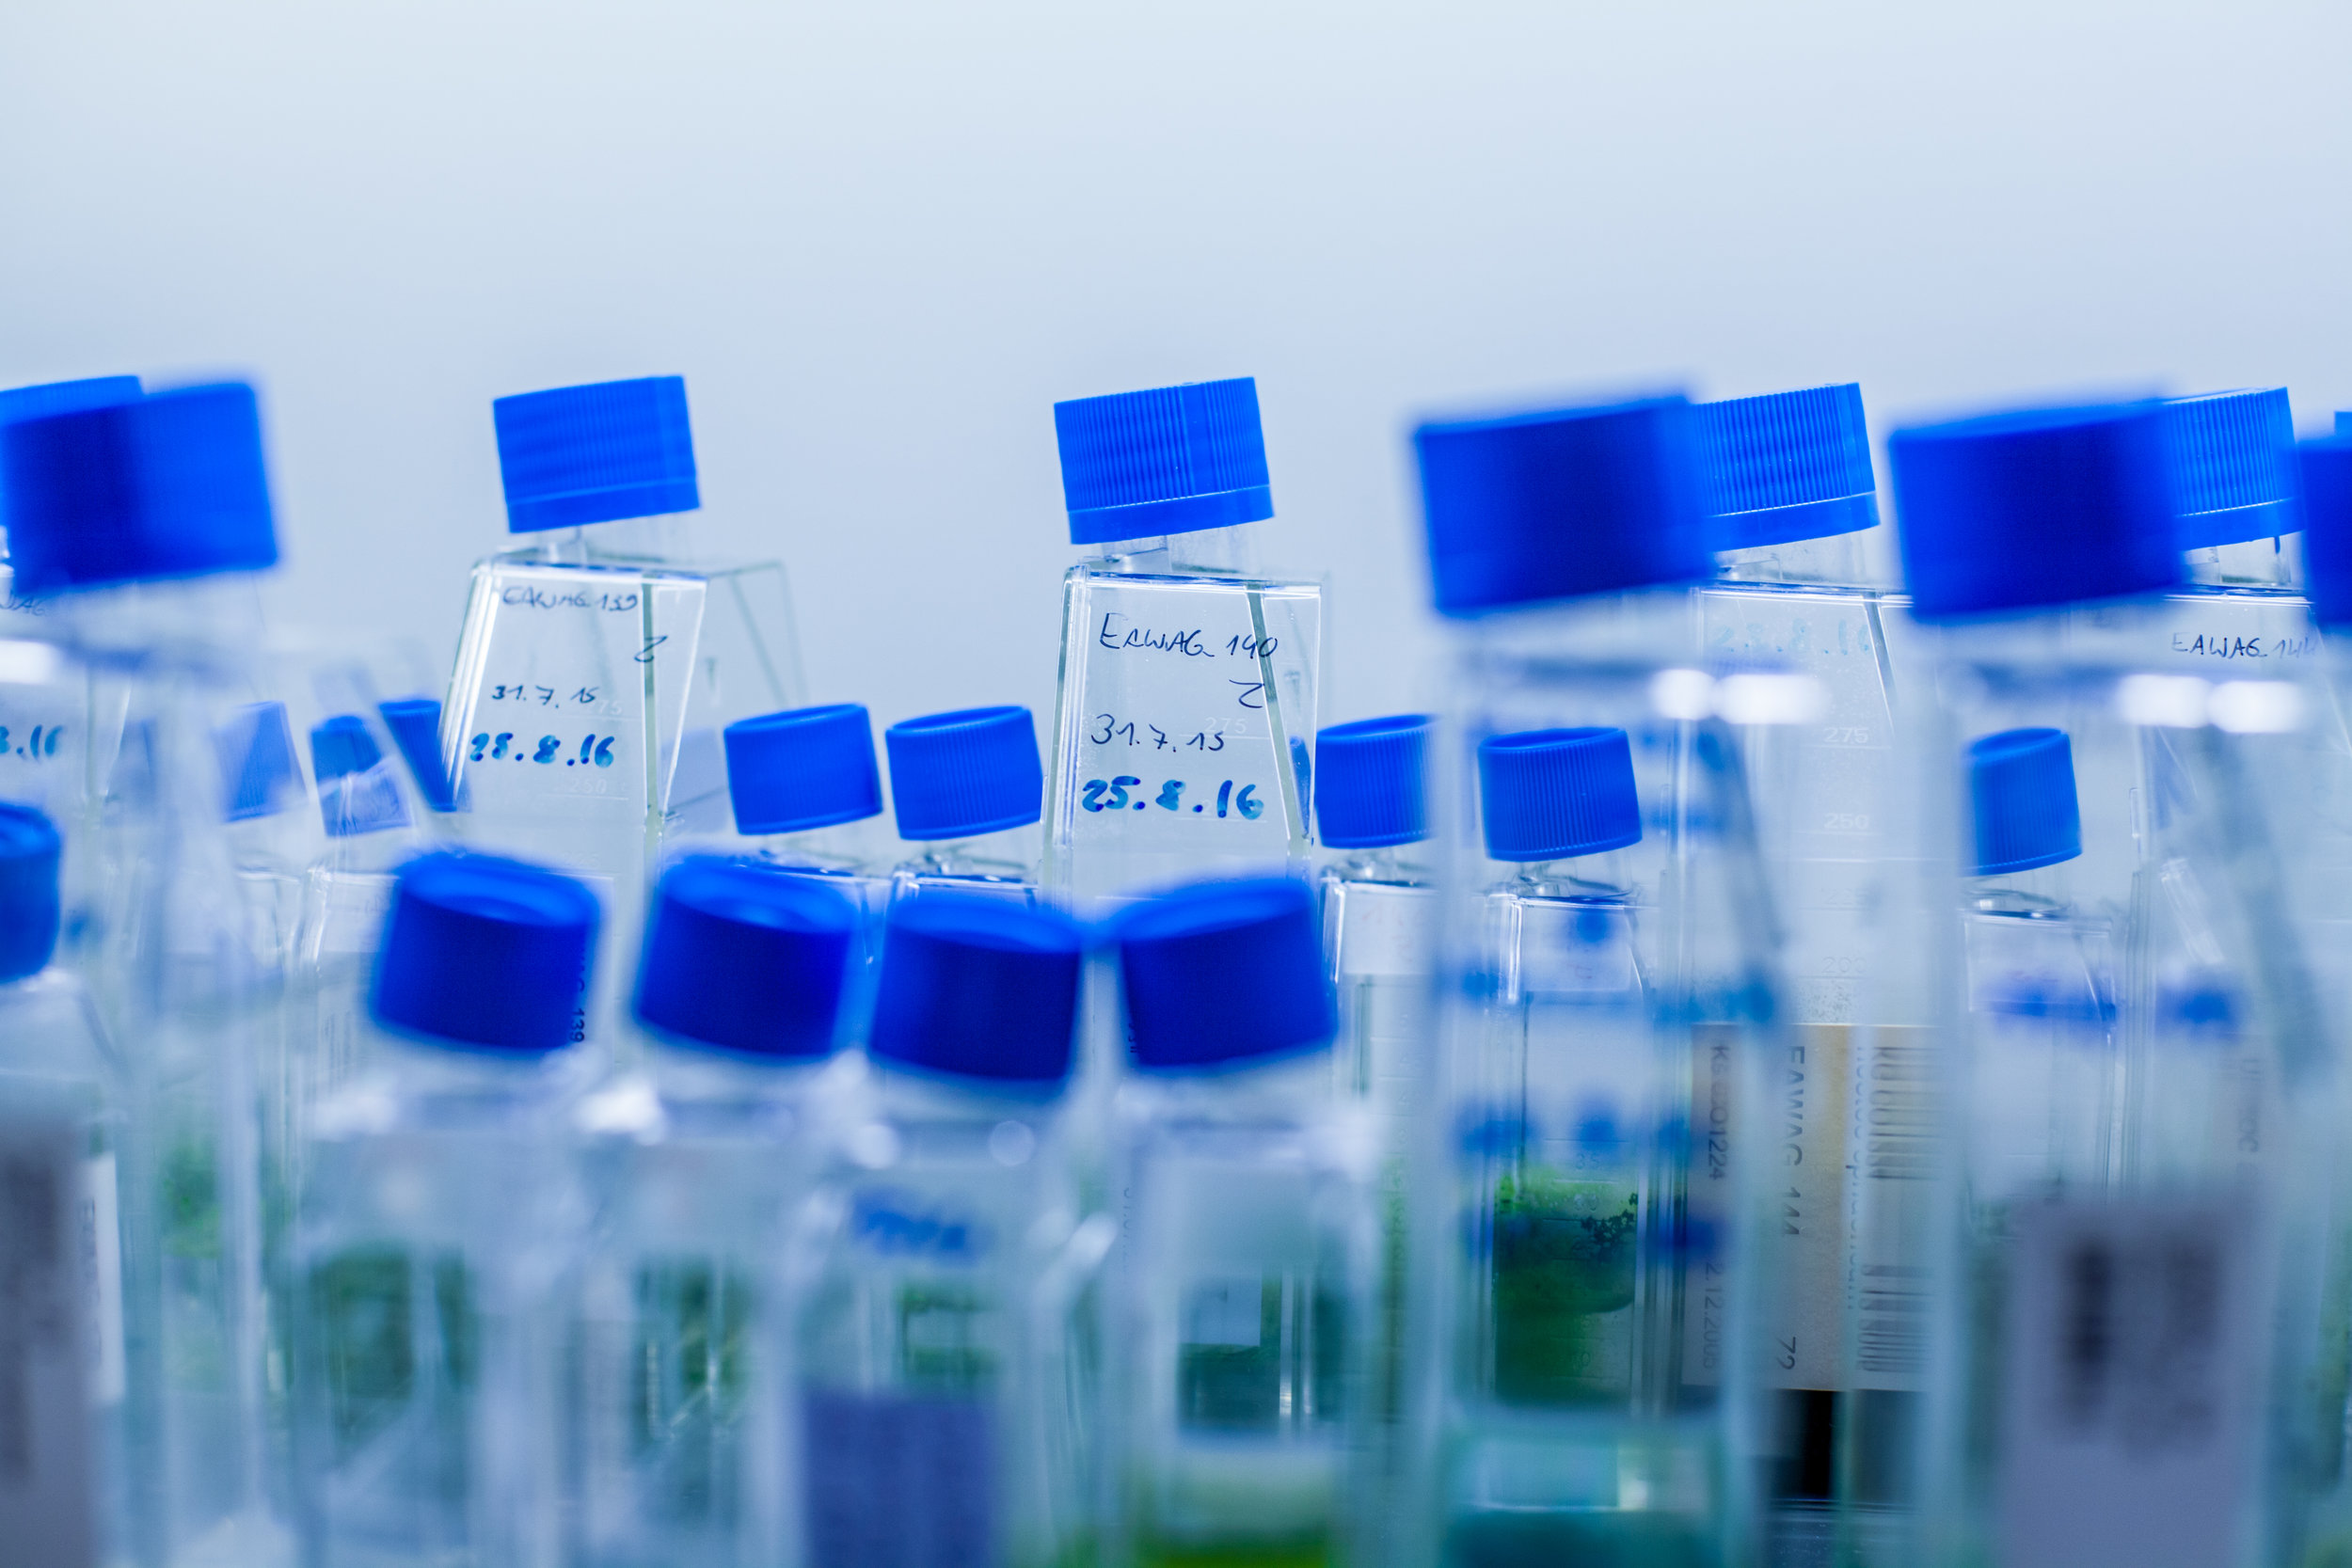 Cyanobacterial culture